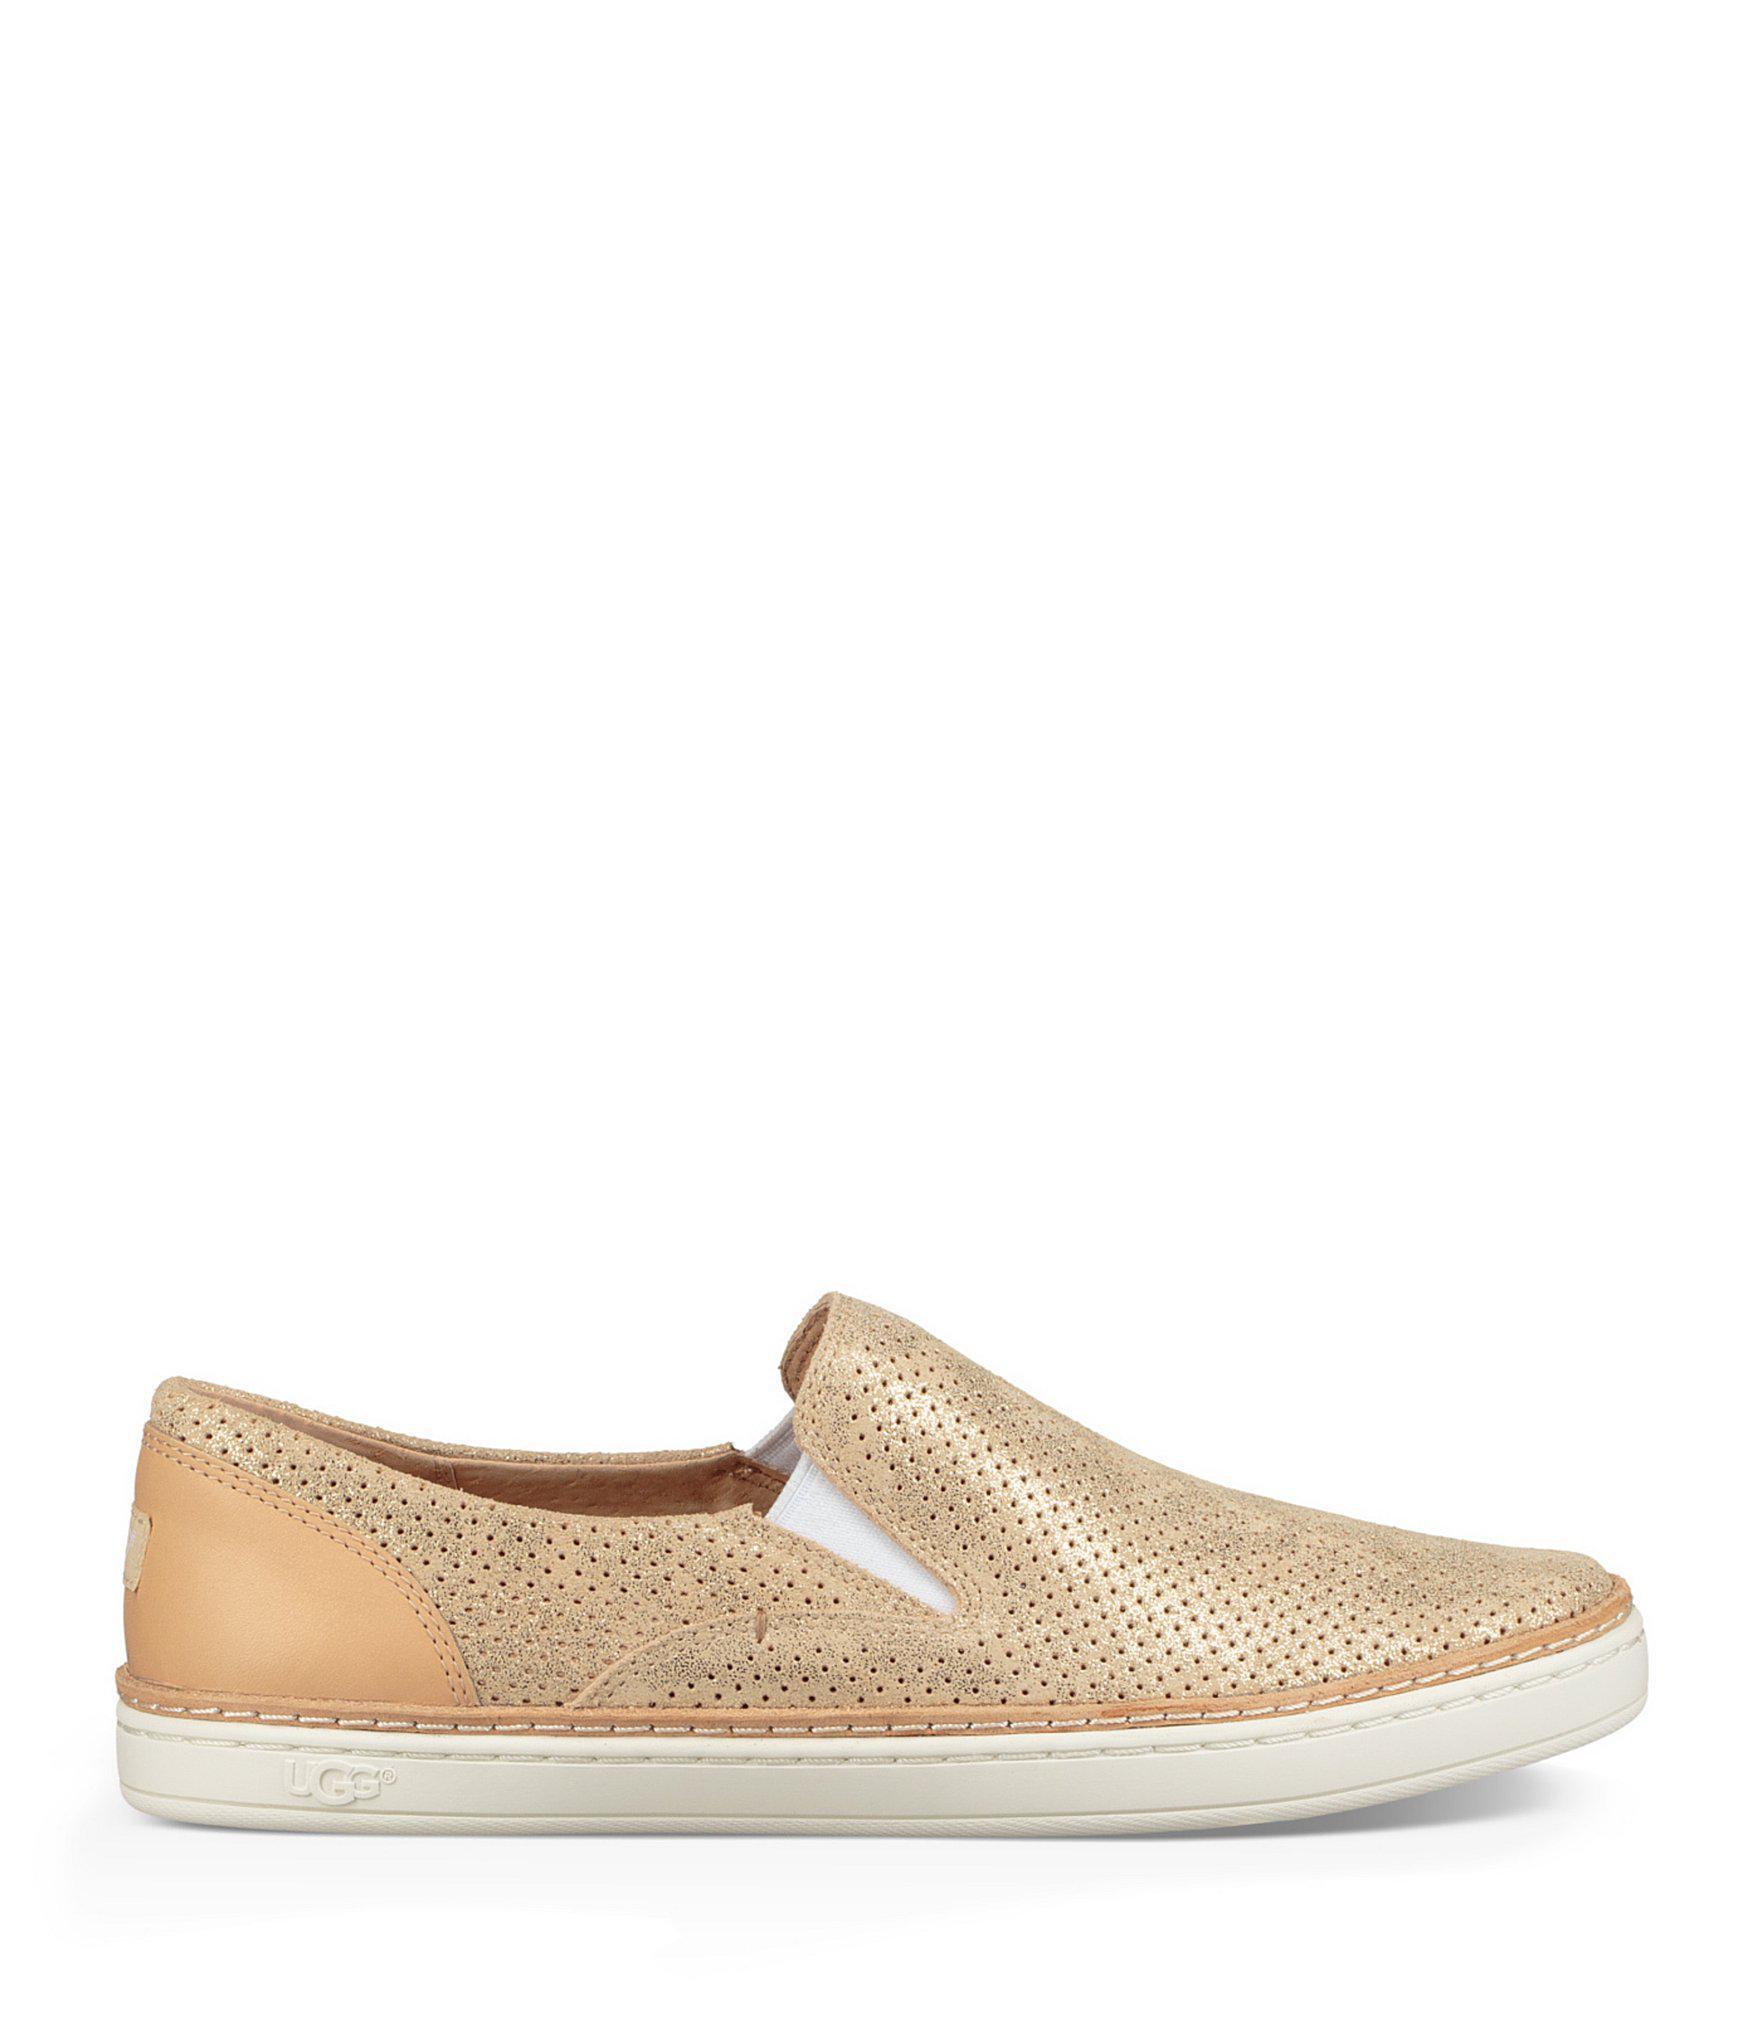 d705c10a029 Ugg - Adley Perf Stardust Metallic Suede Sneakers - Lyst